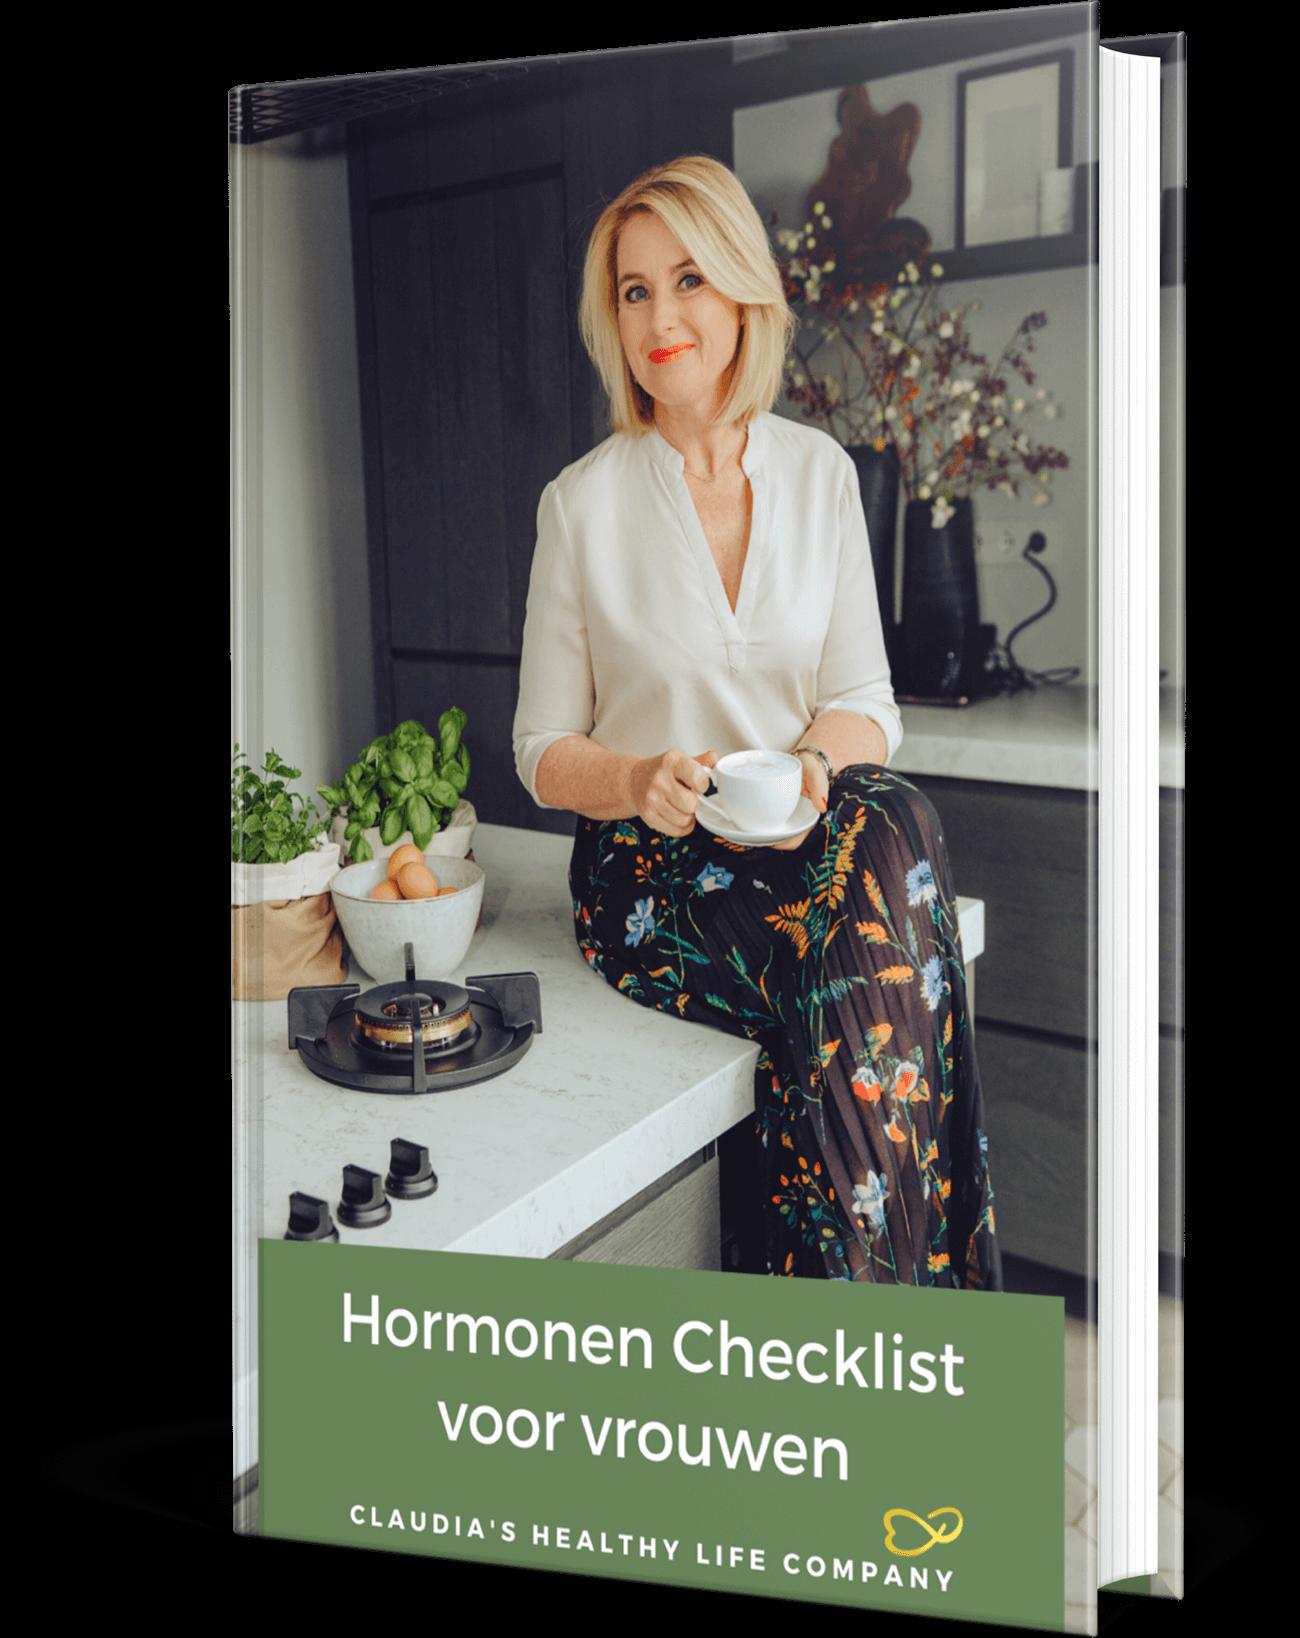 Hormonen Checklist